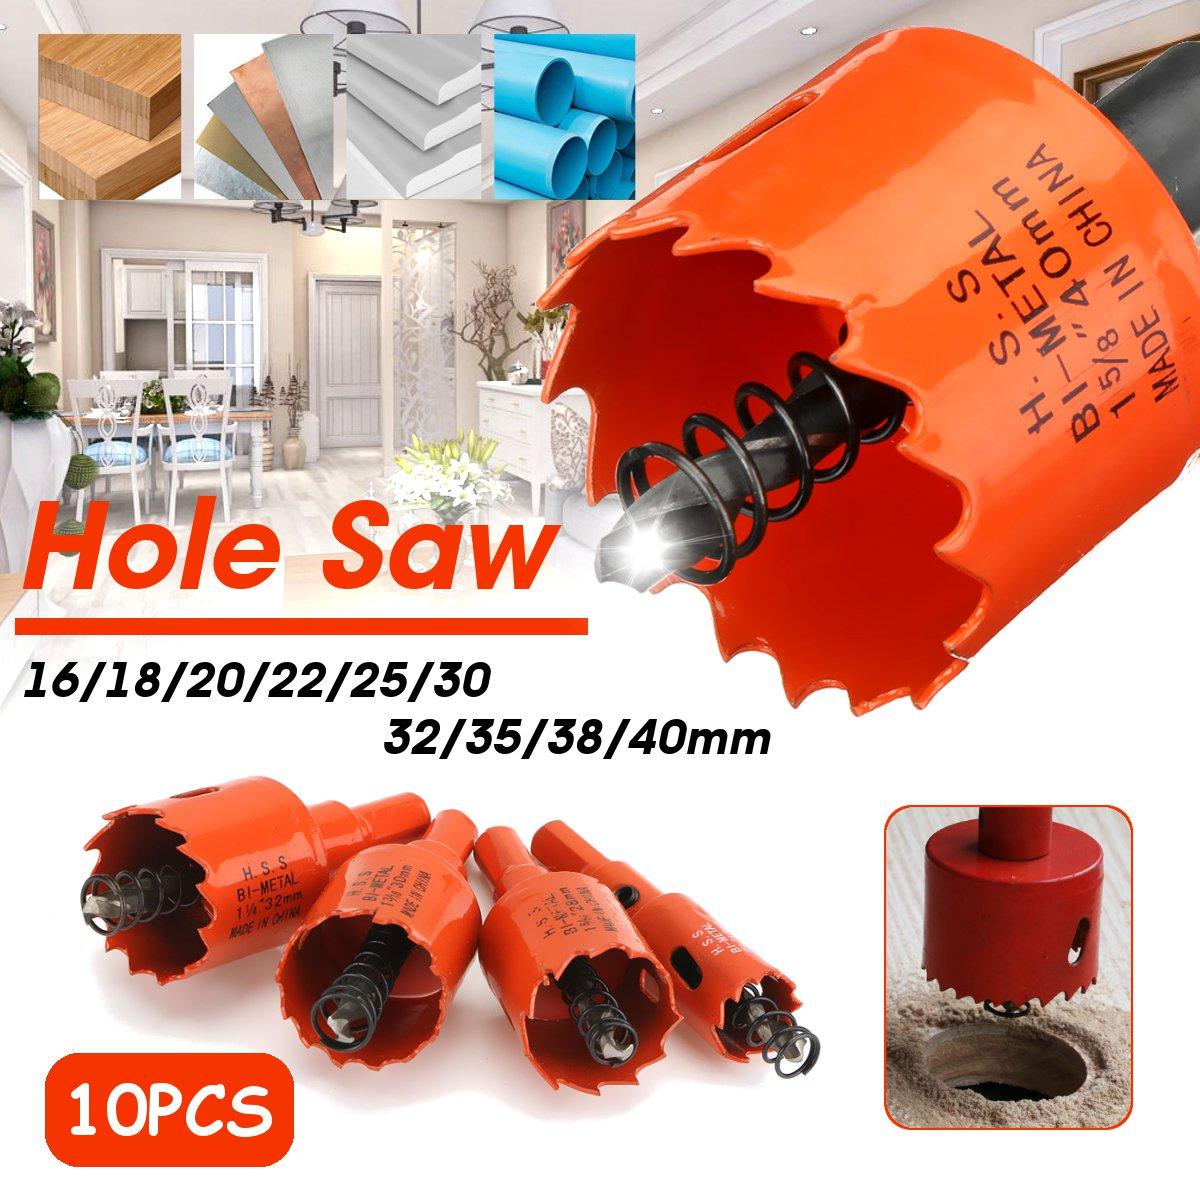 16-200mm HSS Bi-Metal Wood Hole Saw Cutter Tooth Cutter Drill Bit For Woodworking DIY Wood Cutter Drill Bit Set PVC Plastic